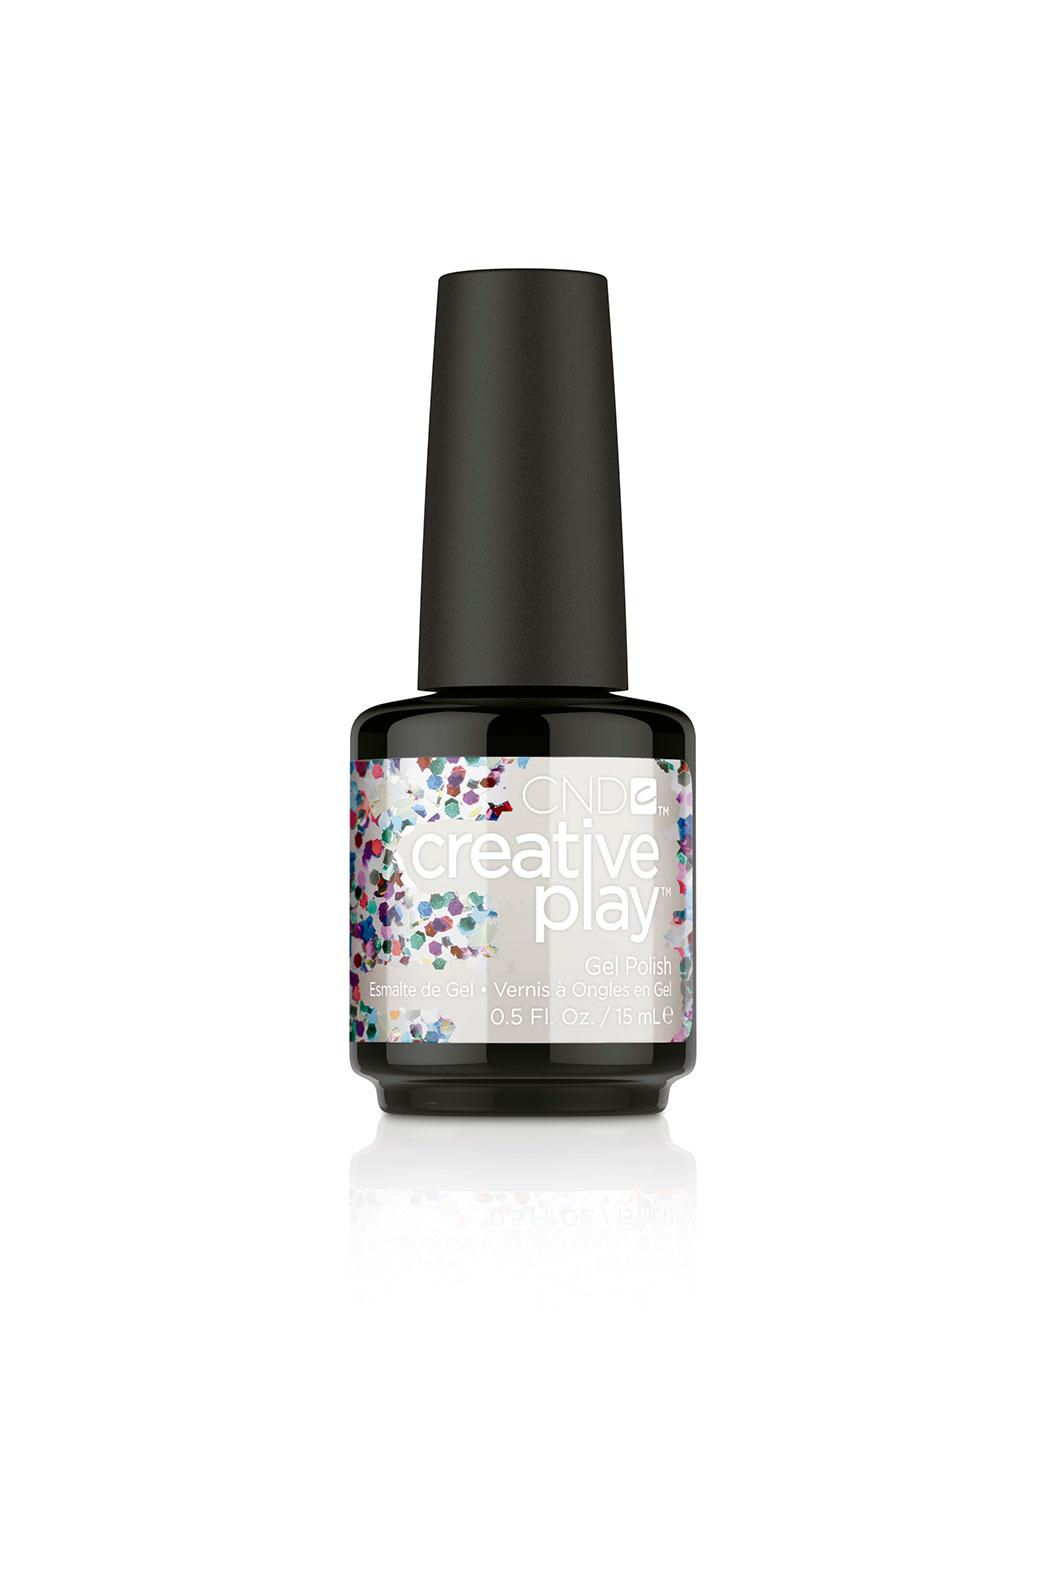 CND 449 гель-лак для ногтей / Glittabulous Creative Play Gel 15 мл cnd топ top coat xpress5 15 мл